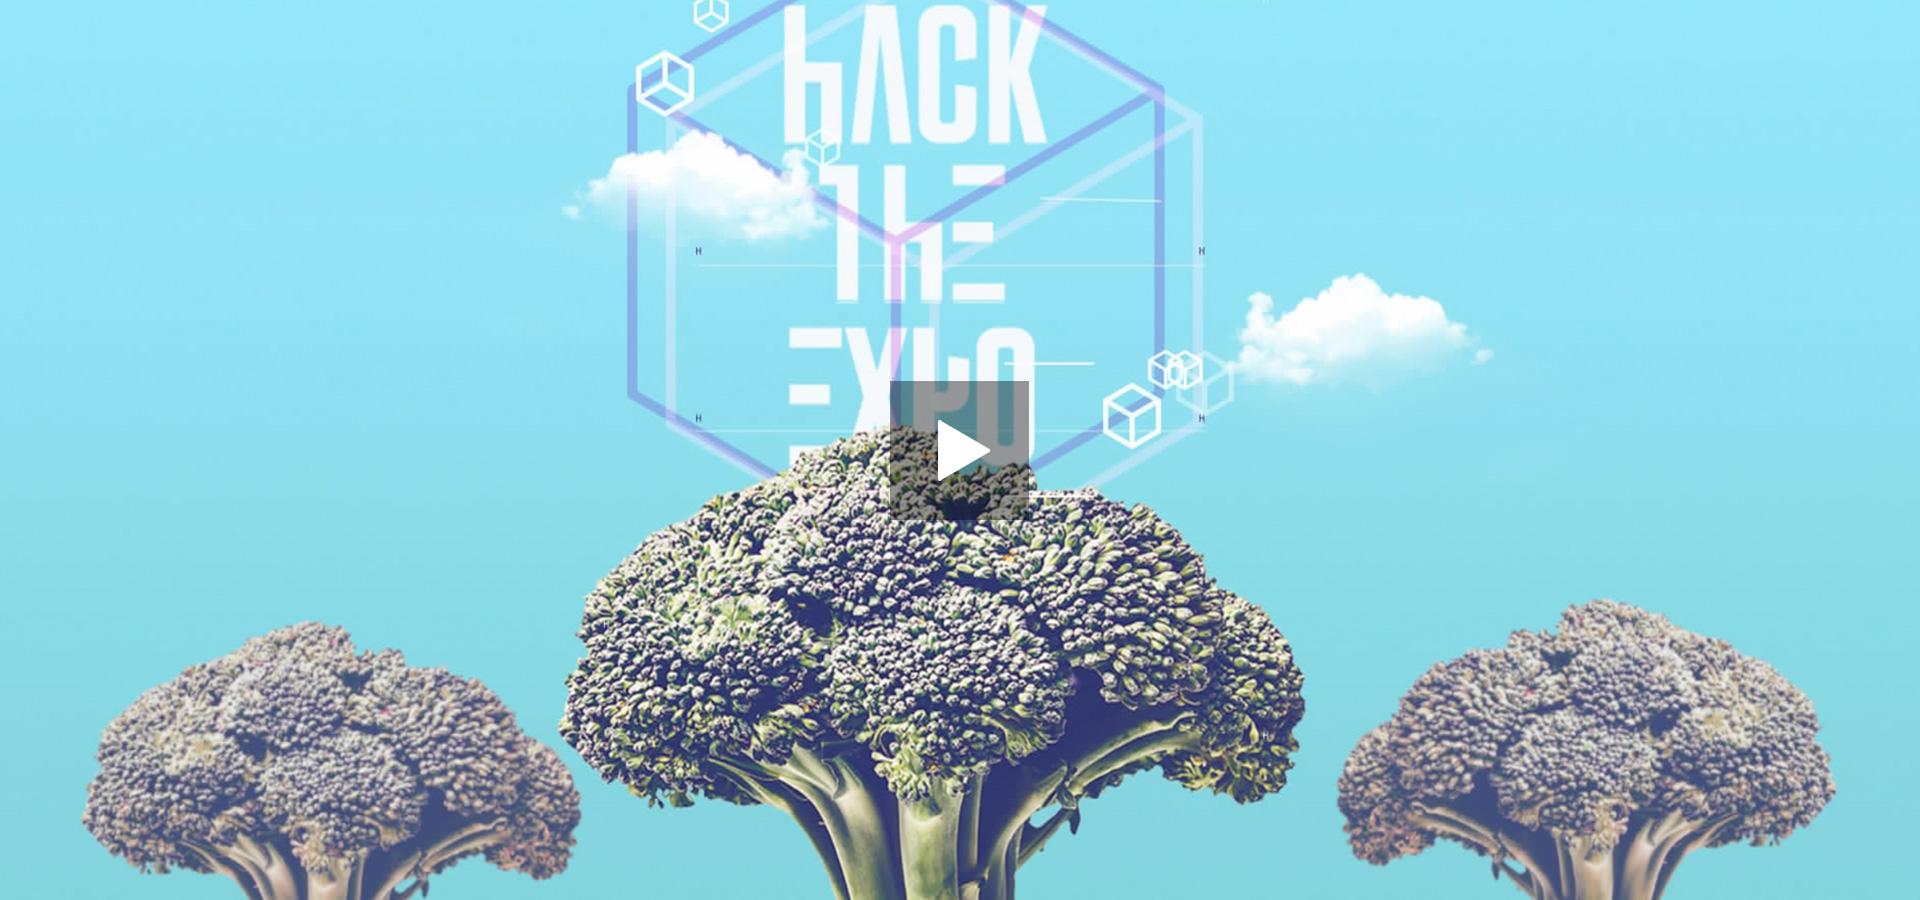 Monkey Talkie per Wired - Motiongraphic - Animazione 2d